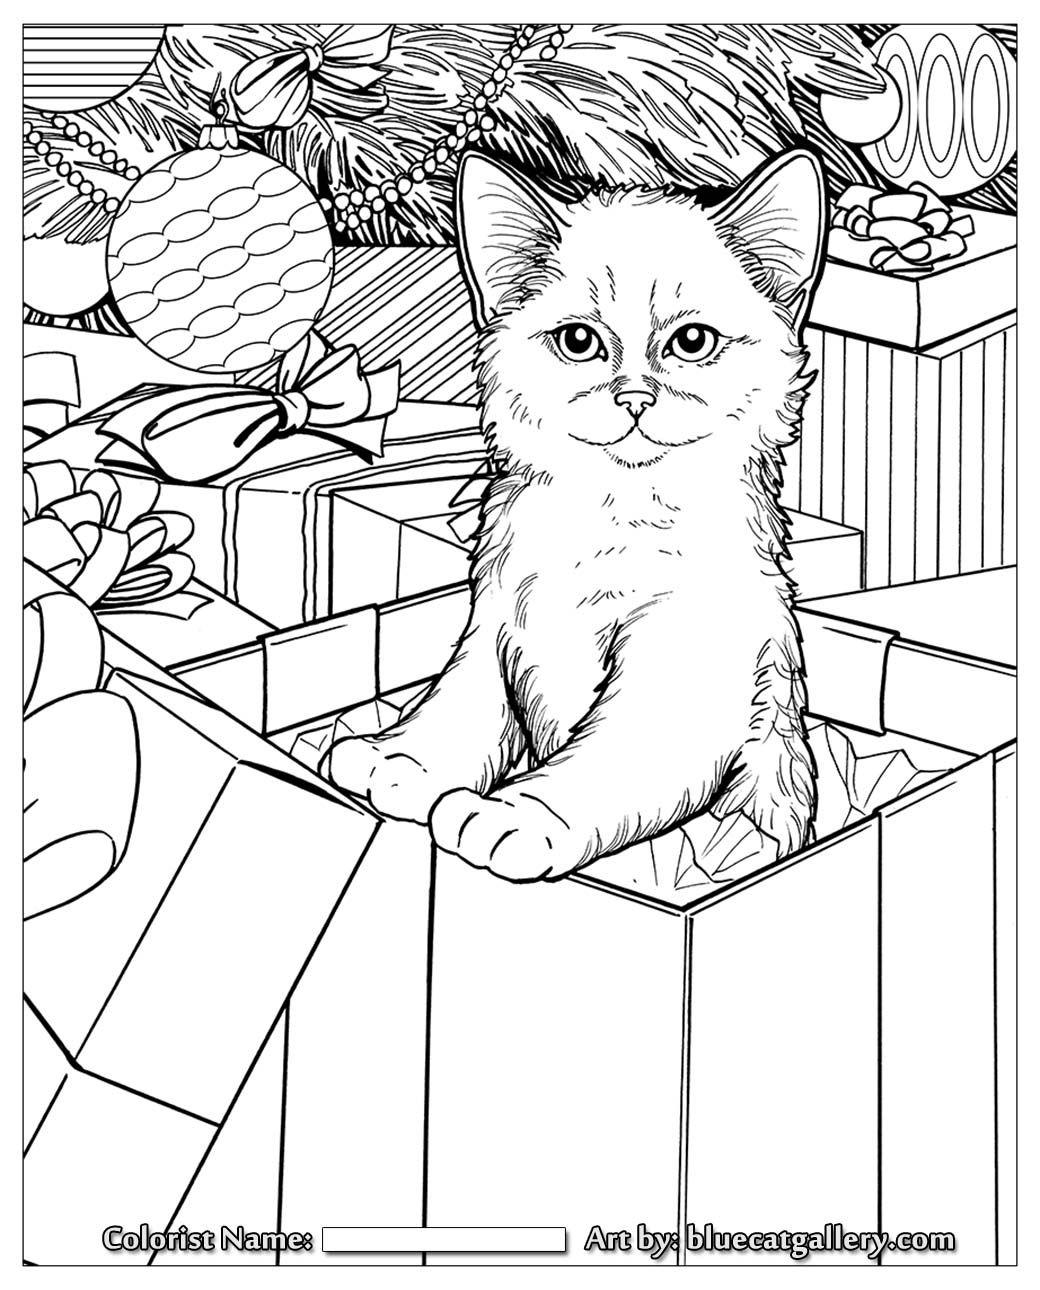 Ausmalbilder Katzen Für Erwachsene : Bluecat Gallery Adult Coloring Books By Jason Hamilton Coloring